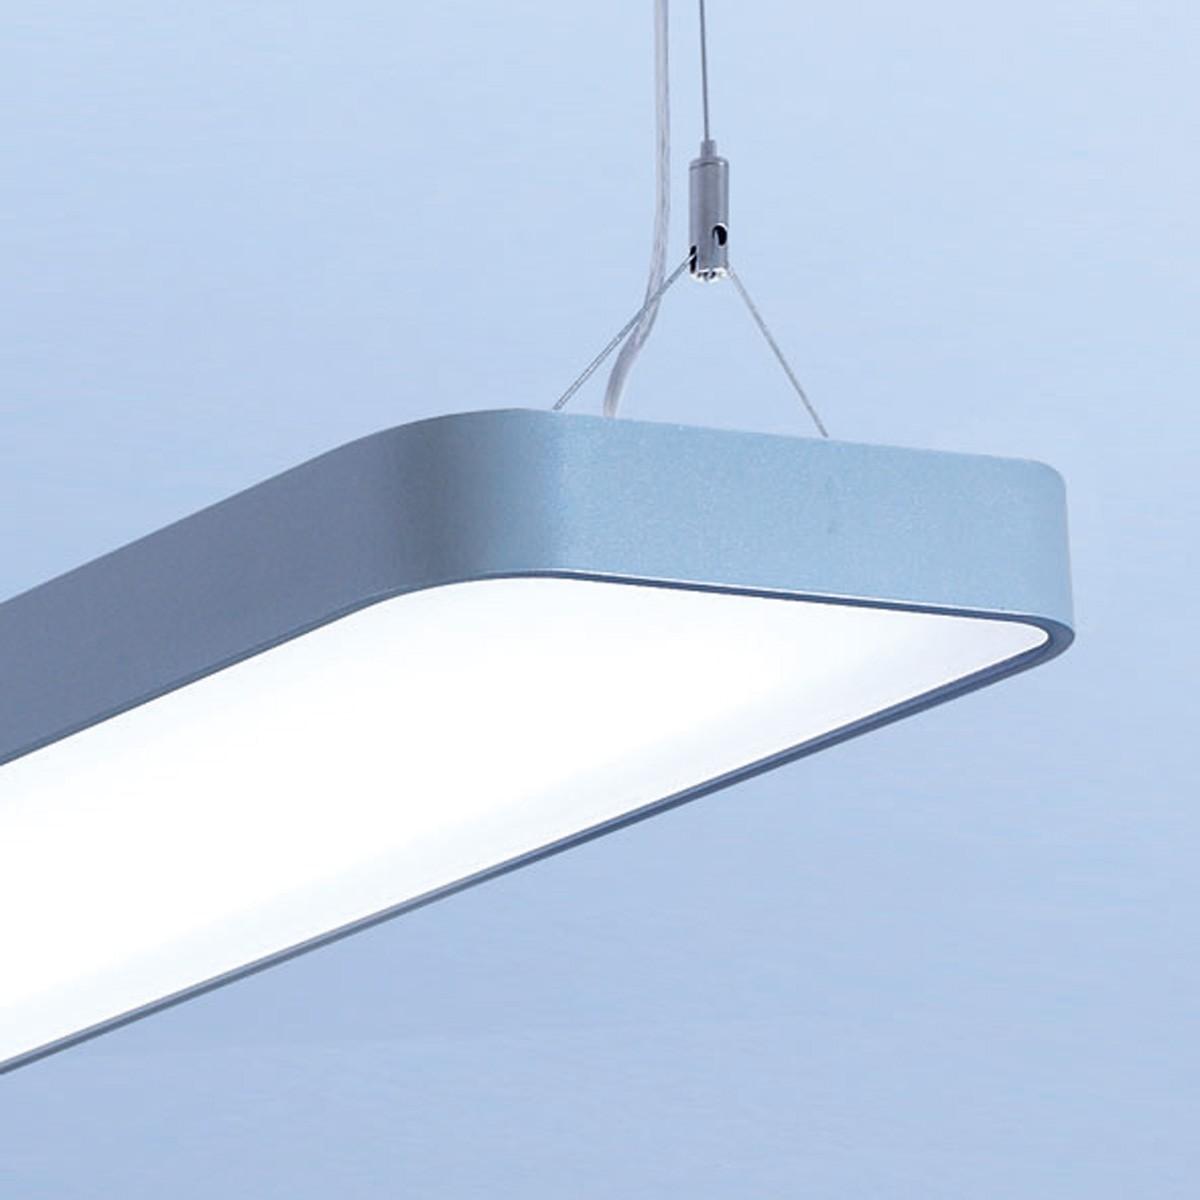 Lightnet Caleo-P1 Pendelleuchte, Länge: 120 cm, Silber matt